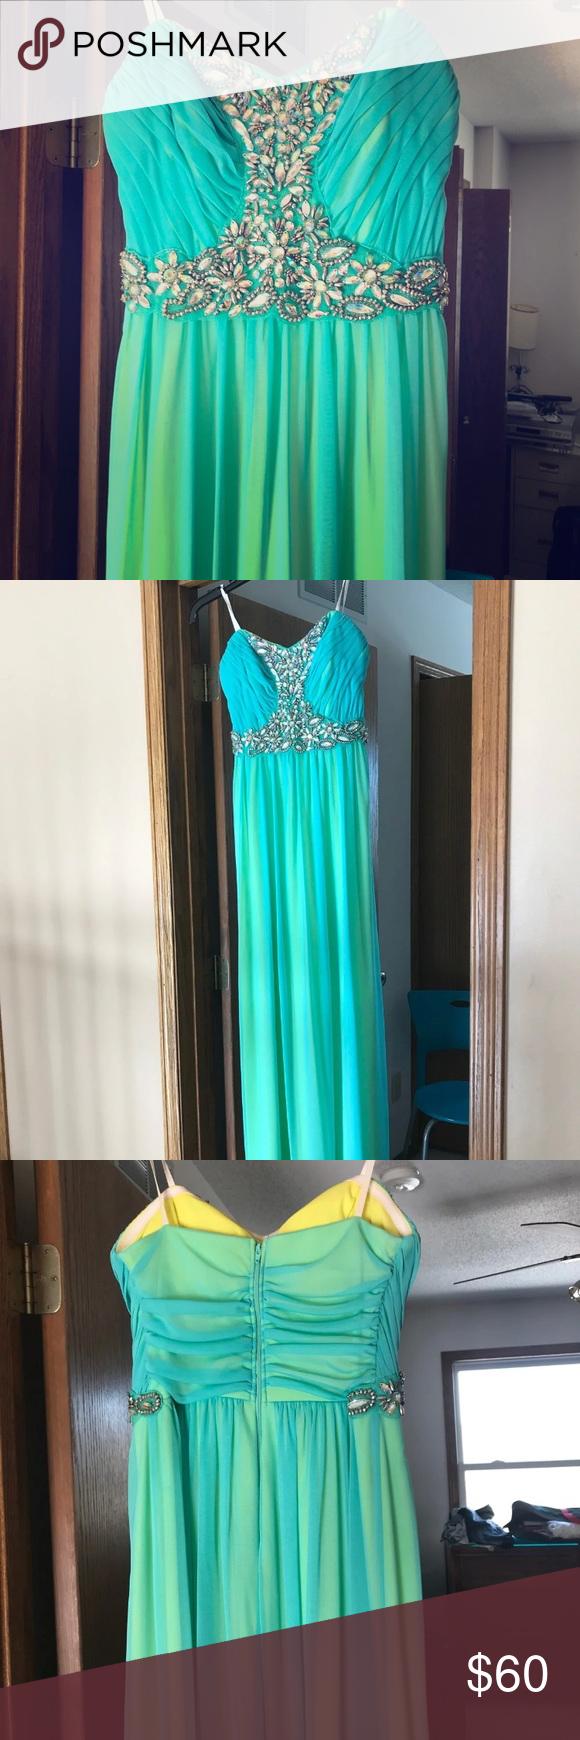 Prom dress my posh closet pinterest prom dresses dresses and prom